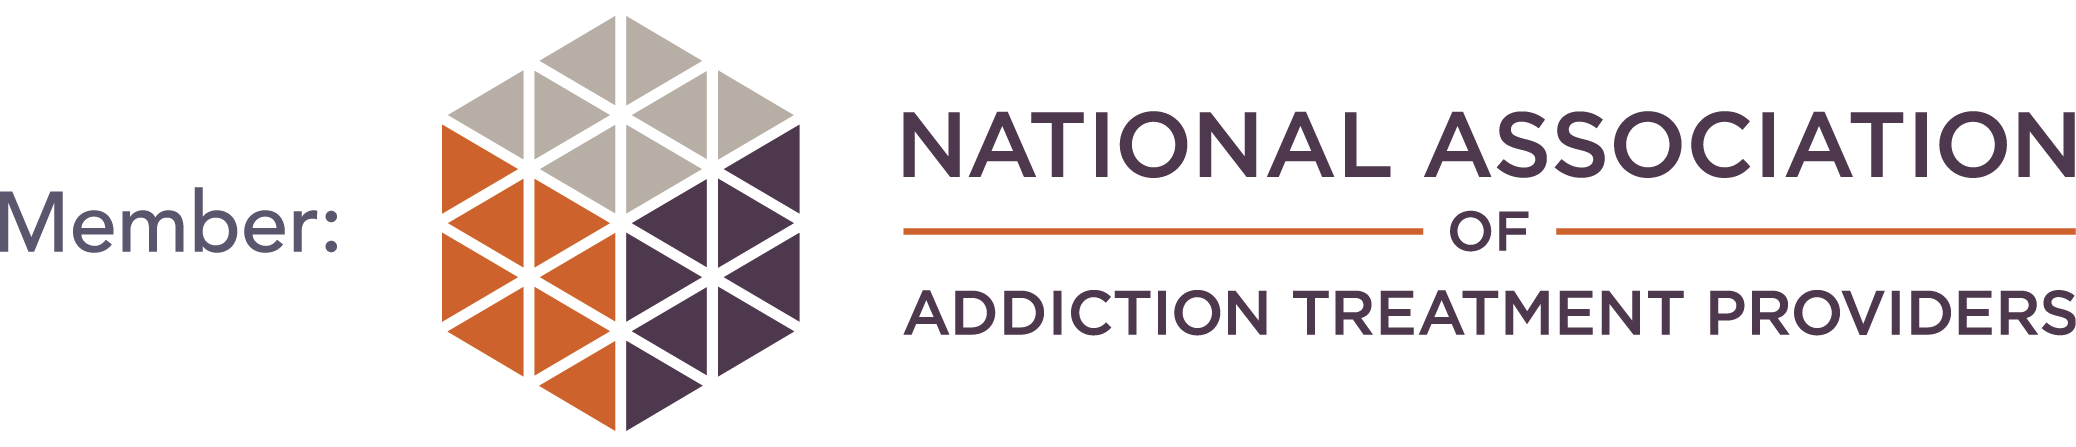 NAATP_Member_Logo_Horizontal_RGB